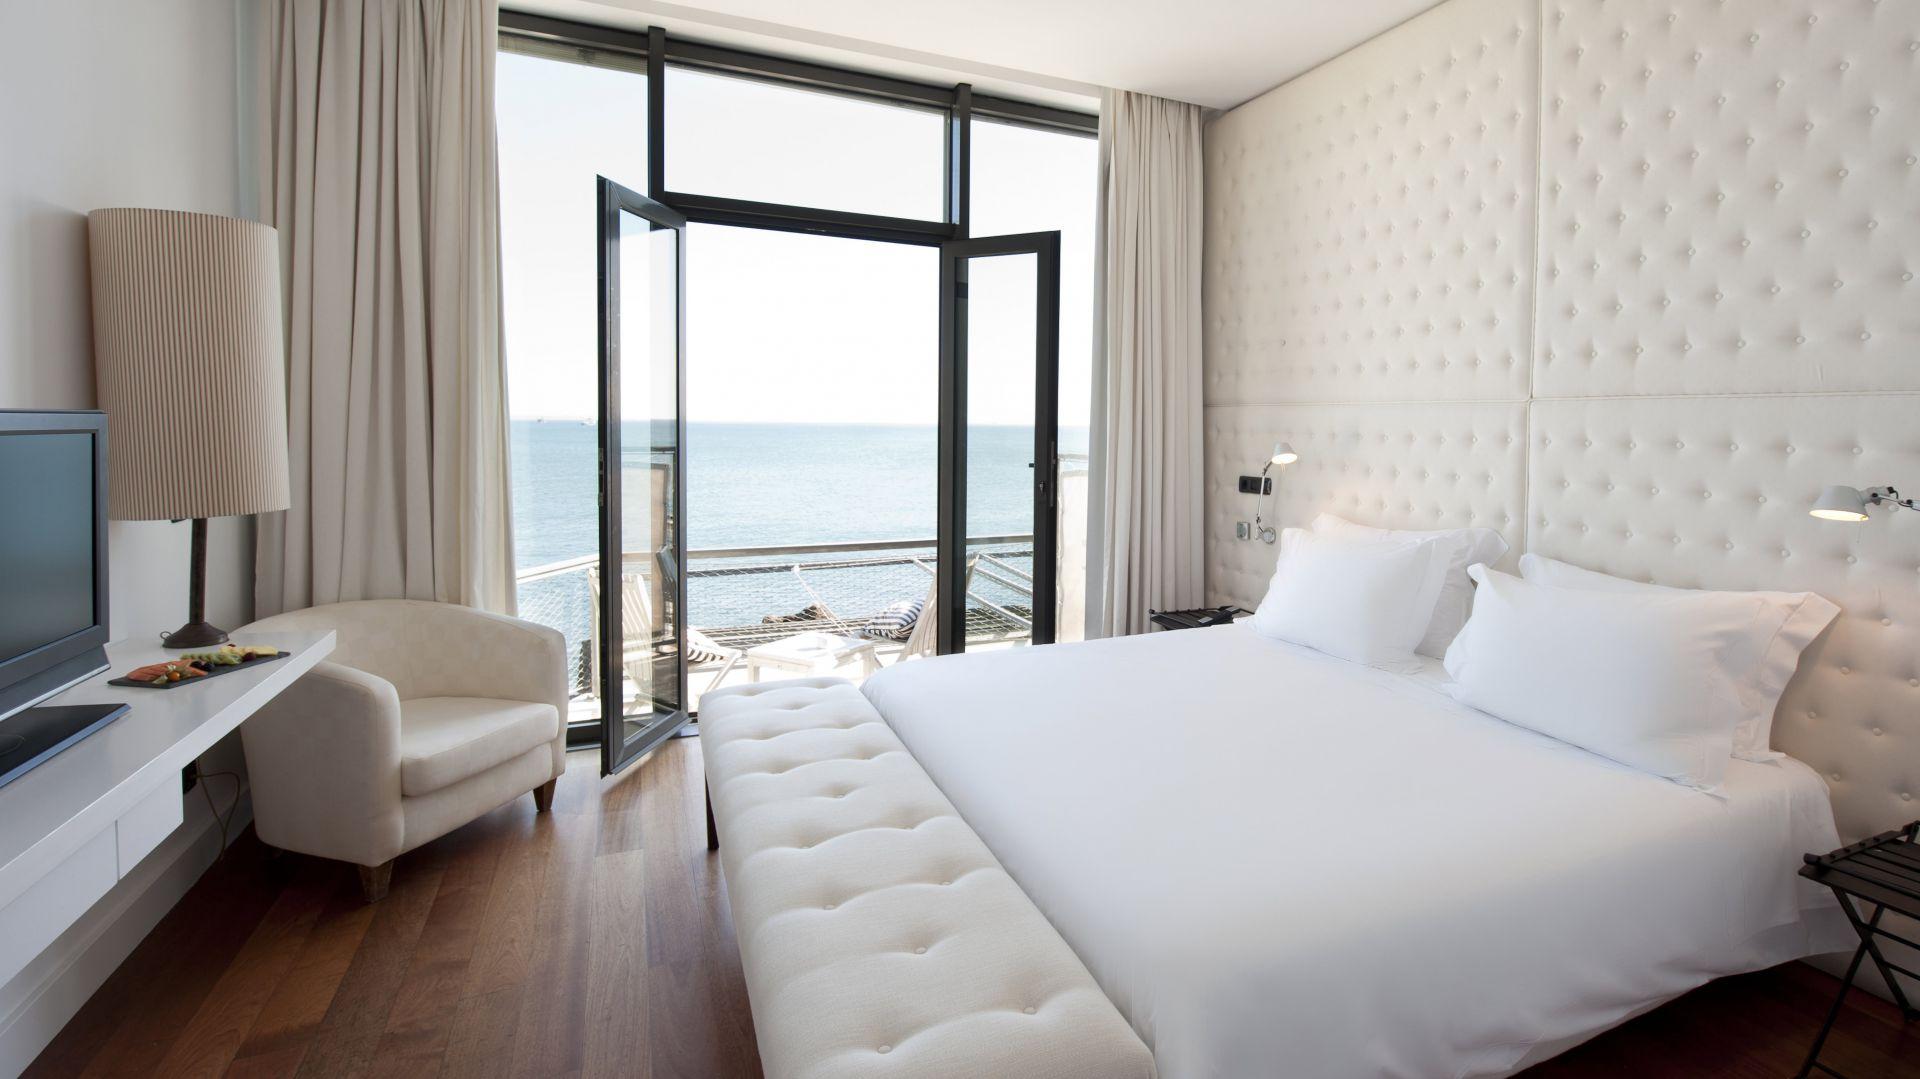 Fot. Farol Hotel,Portugalia.